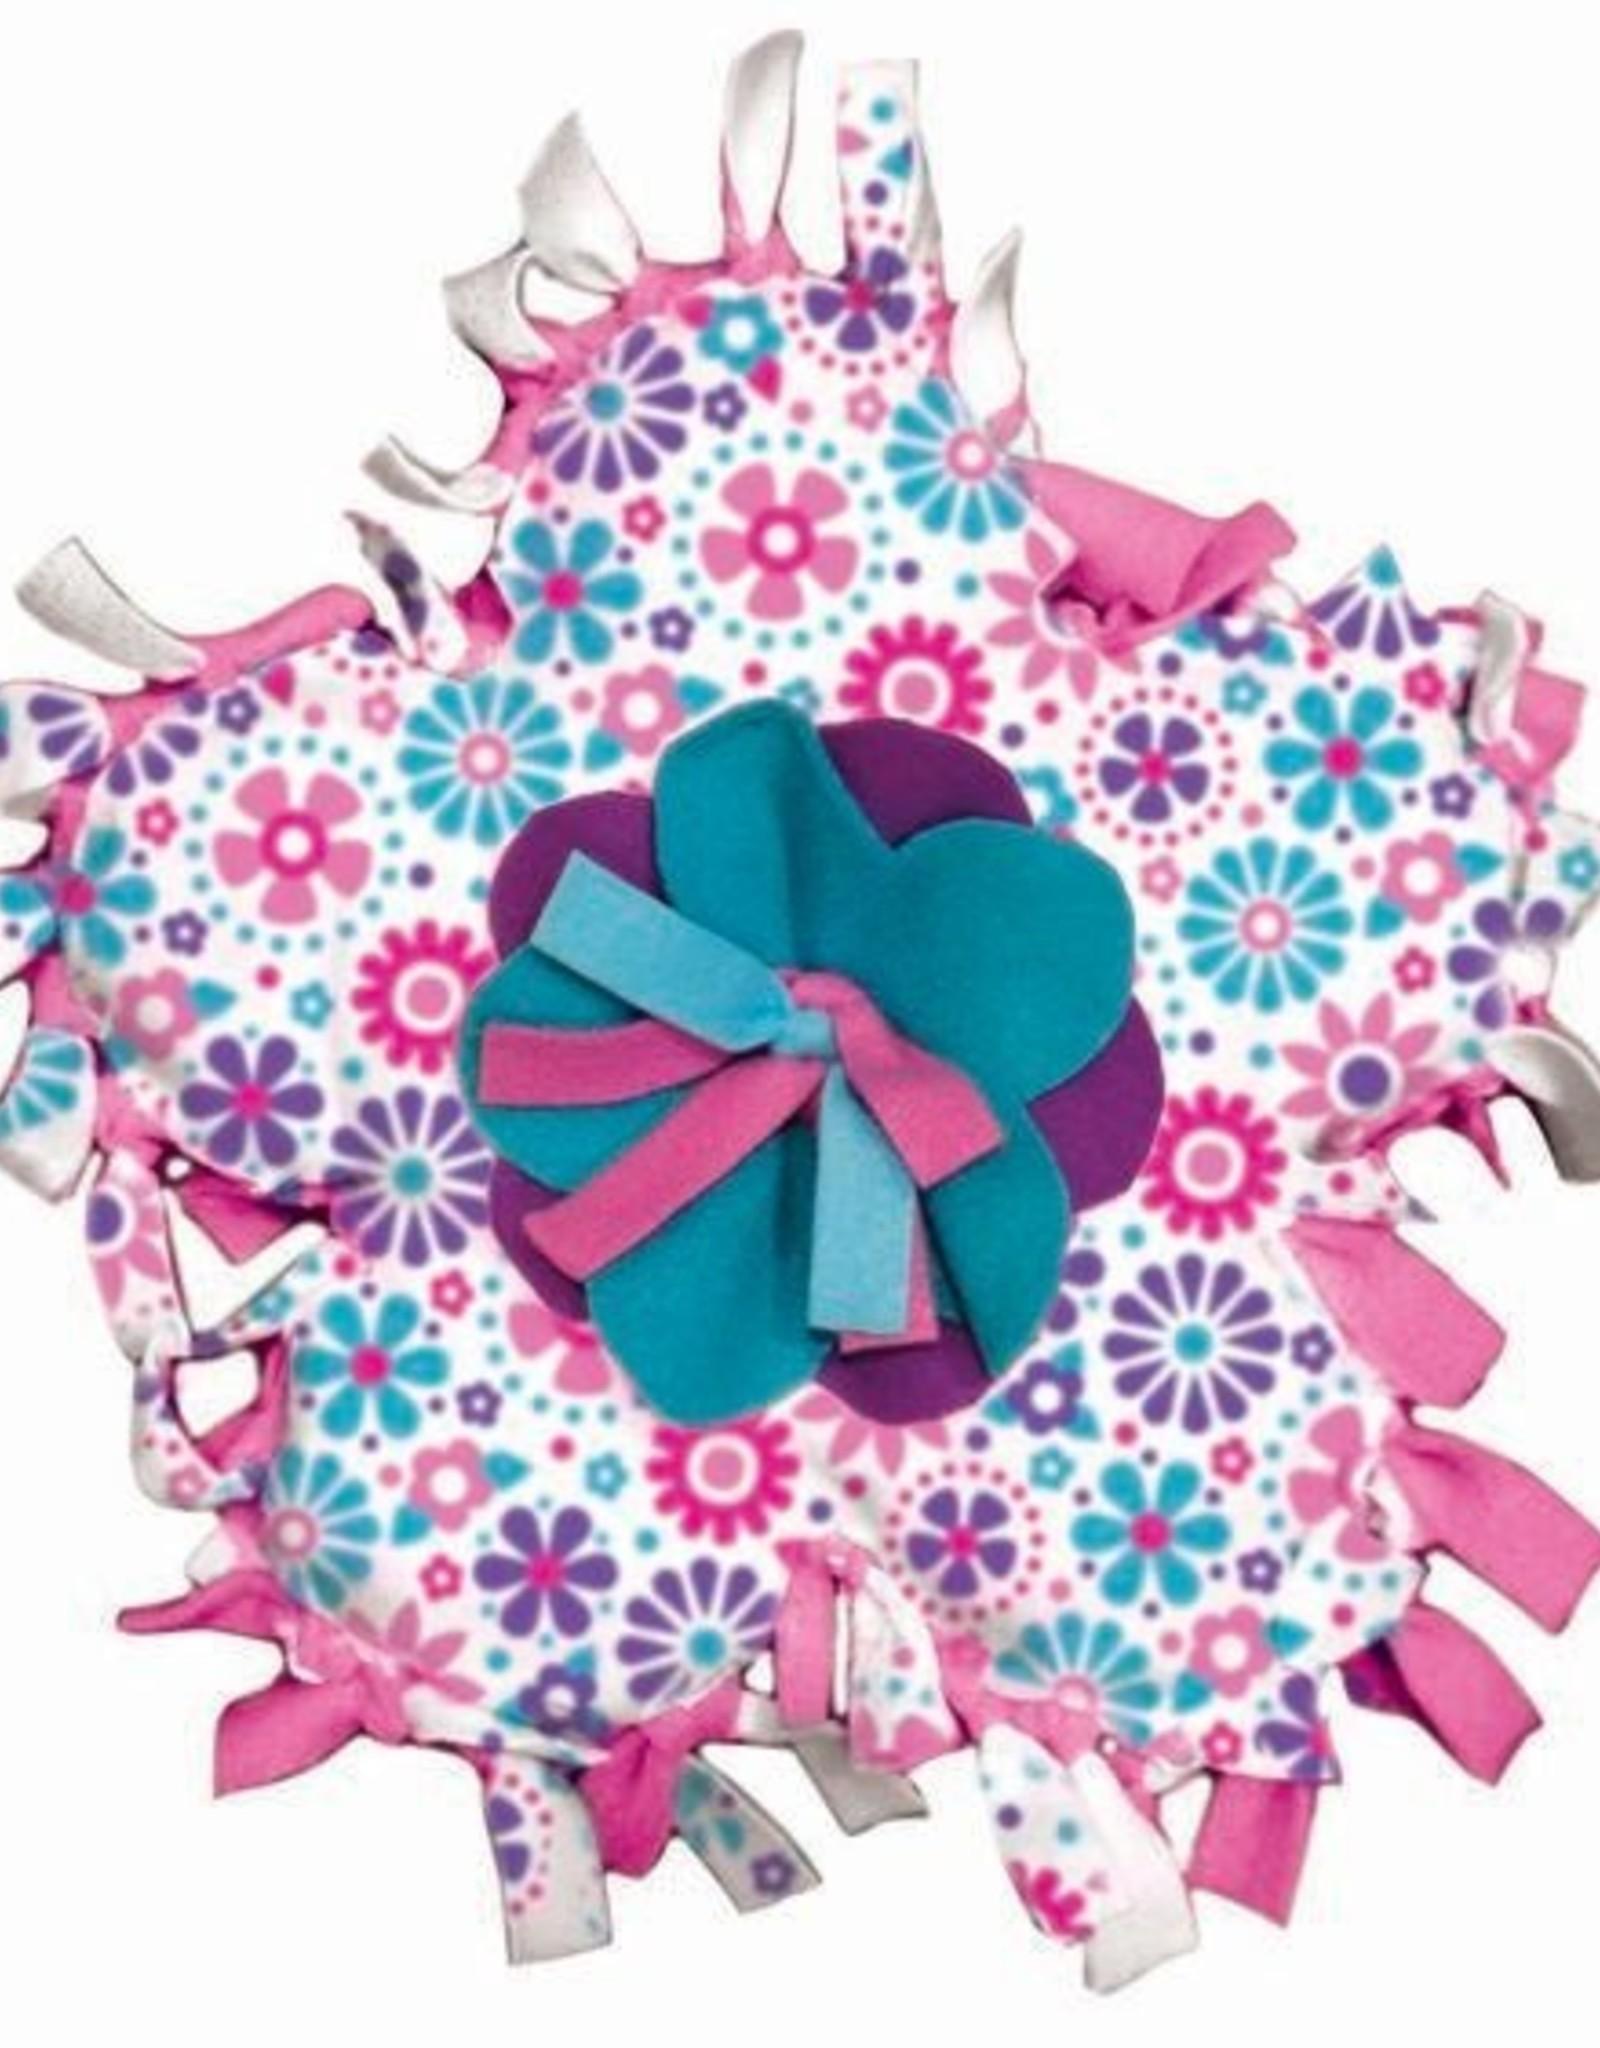 Created by Me! Flower Fleece Pillow